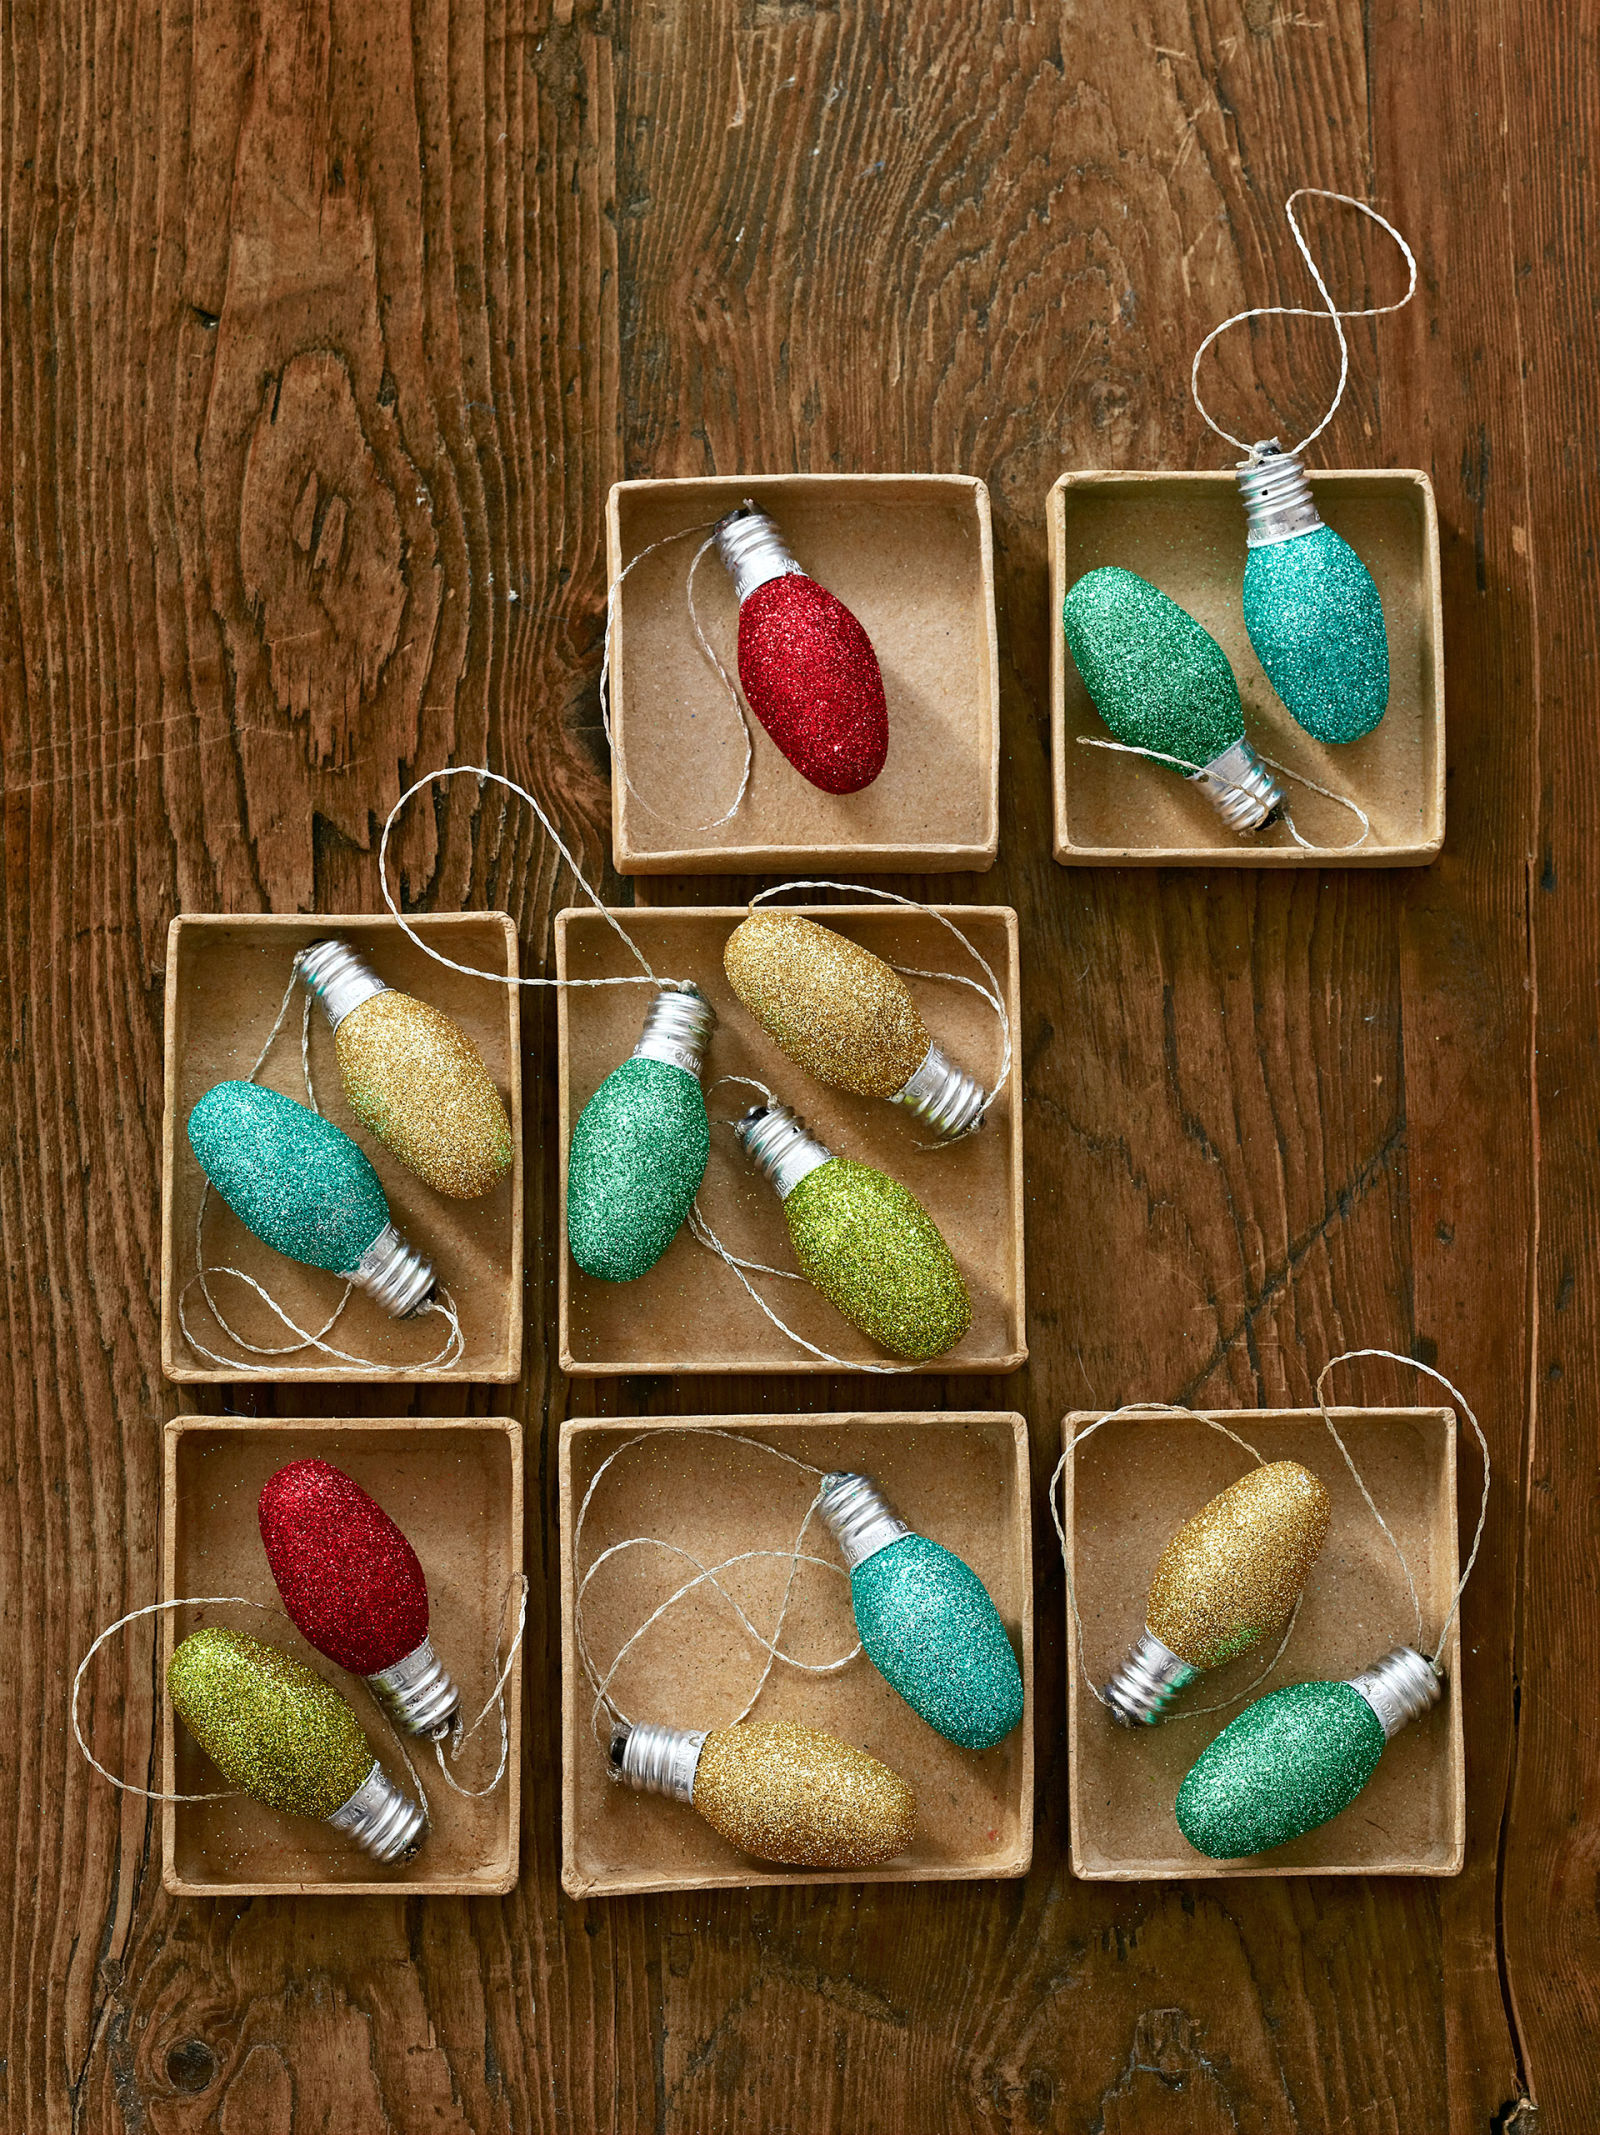 Christmas decorations to make yourself - 50 Homemade Christmas Ornaments Diy Handmade Holiday Tree Ornament Craft Ideas